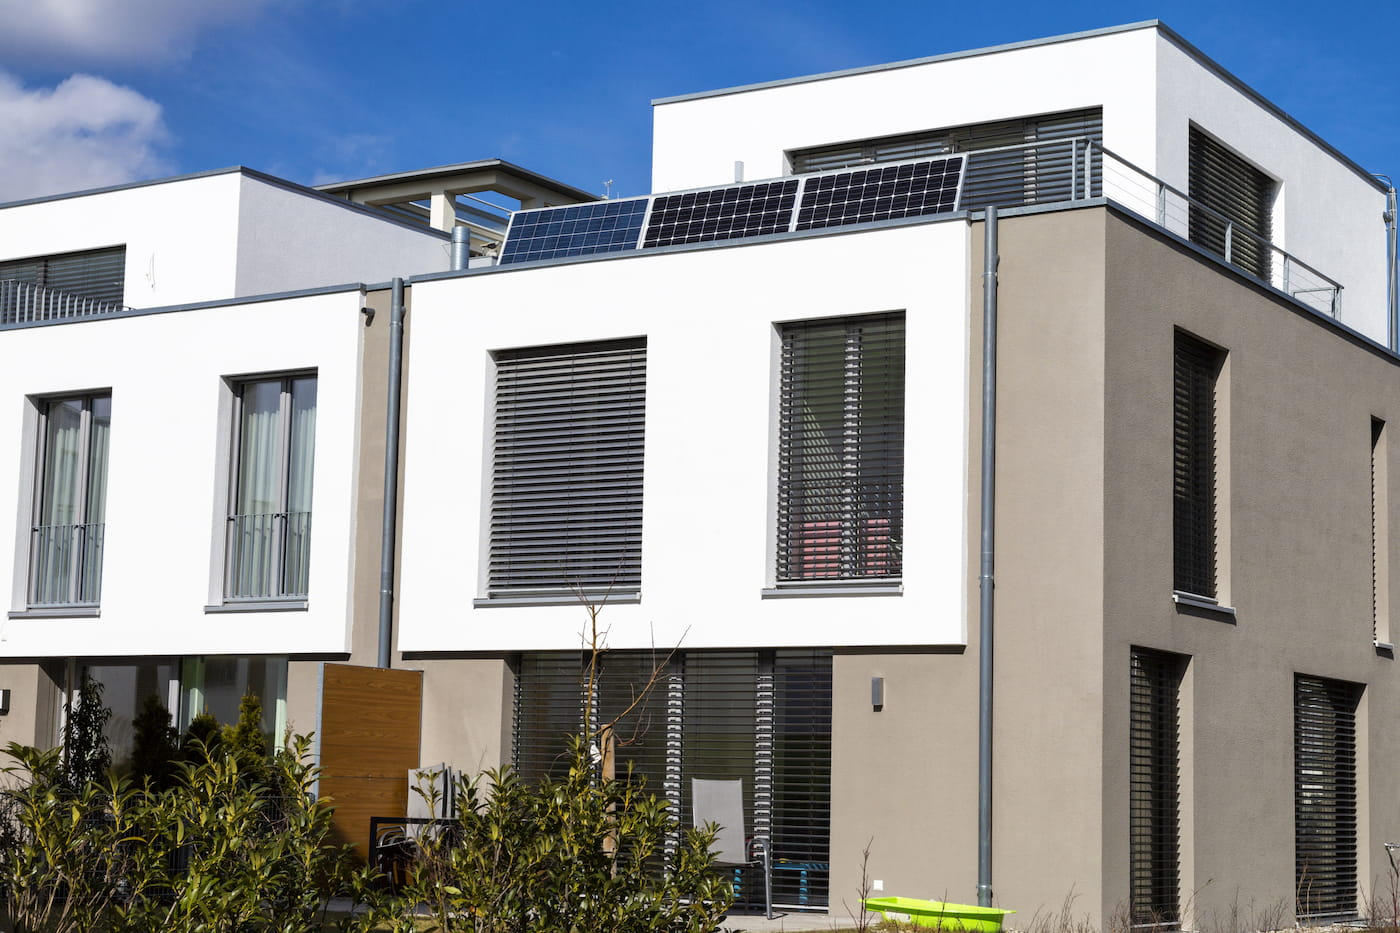 paneles solares en pareados